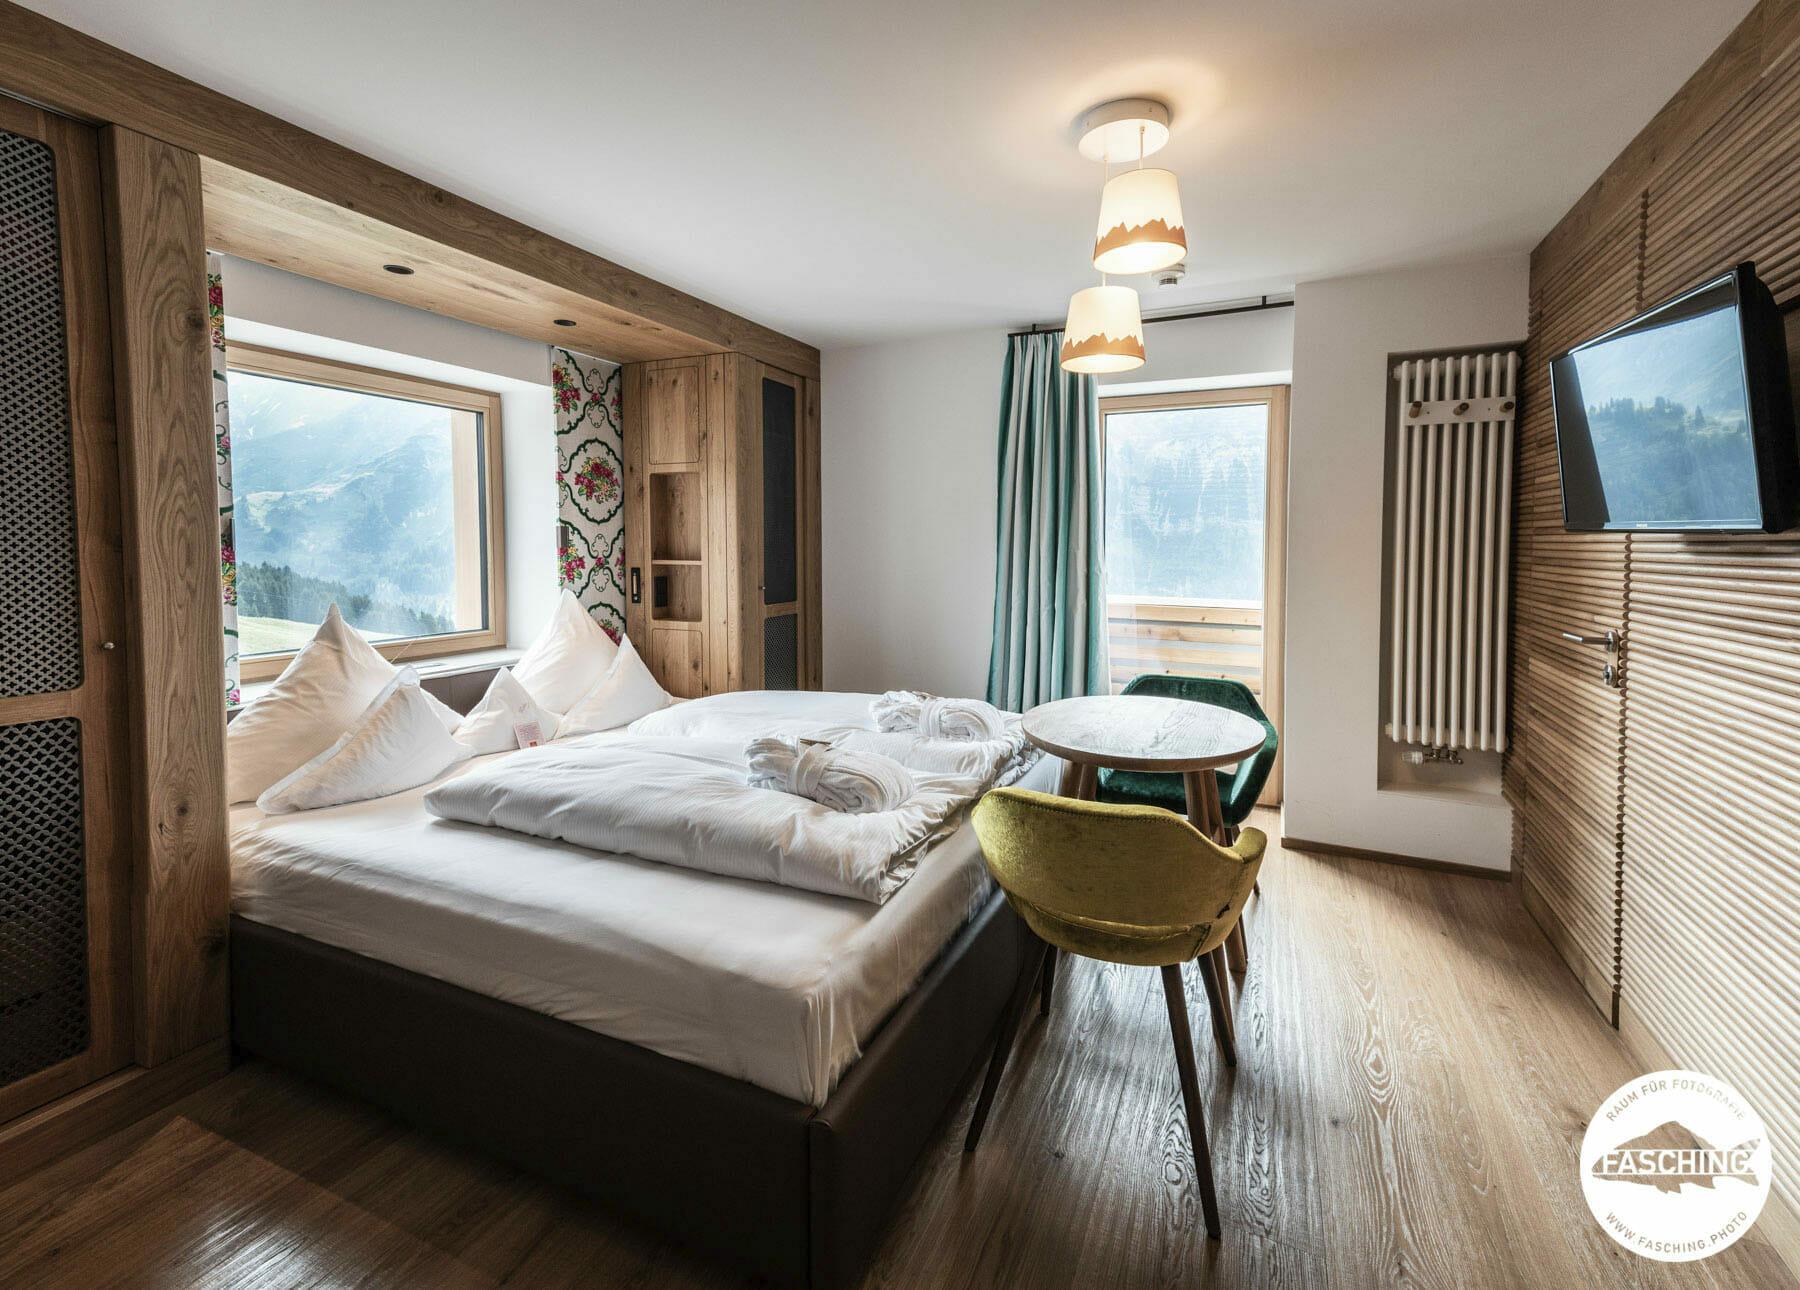 Luca Faschings Hotelfotografie für das Hotel Goldener Berg in Lech